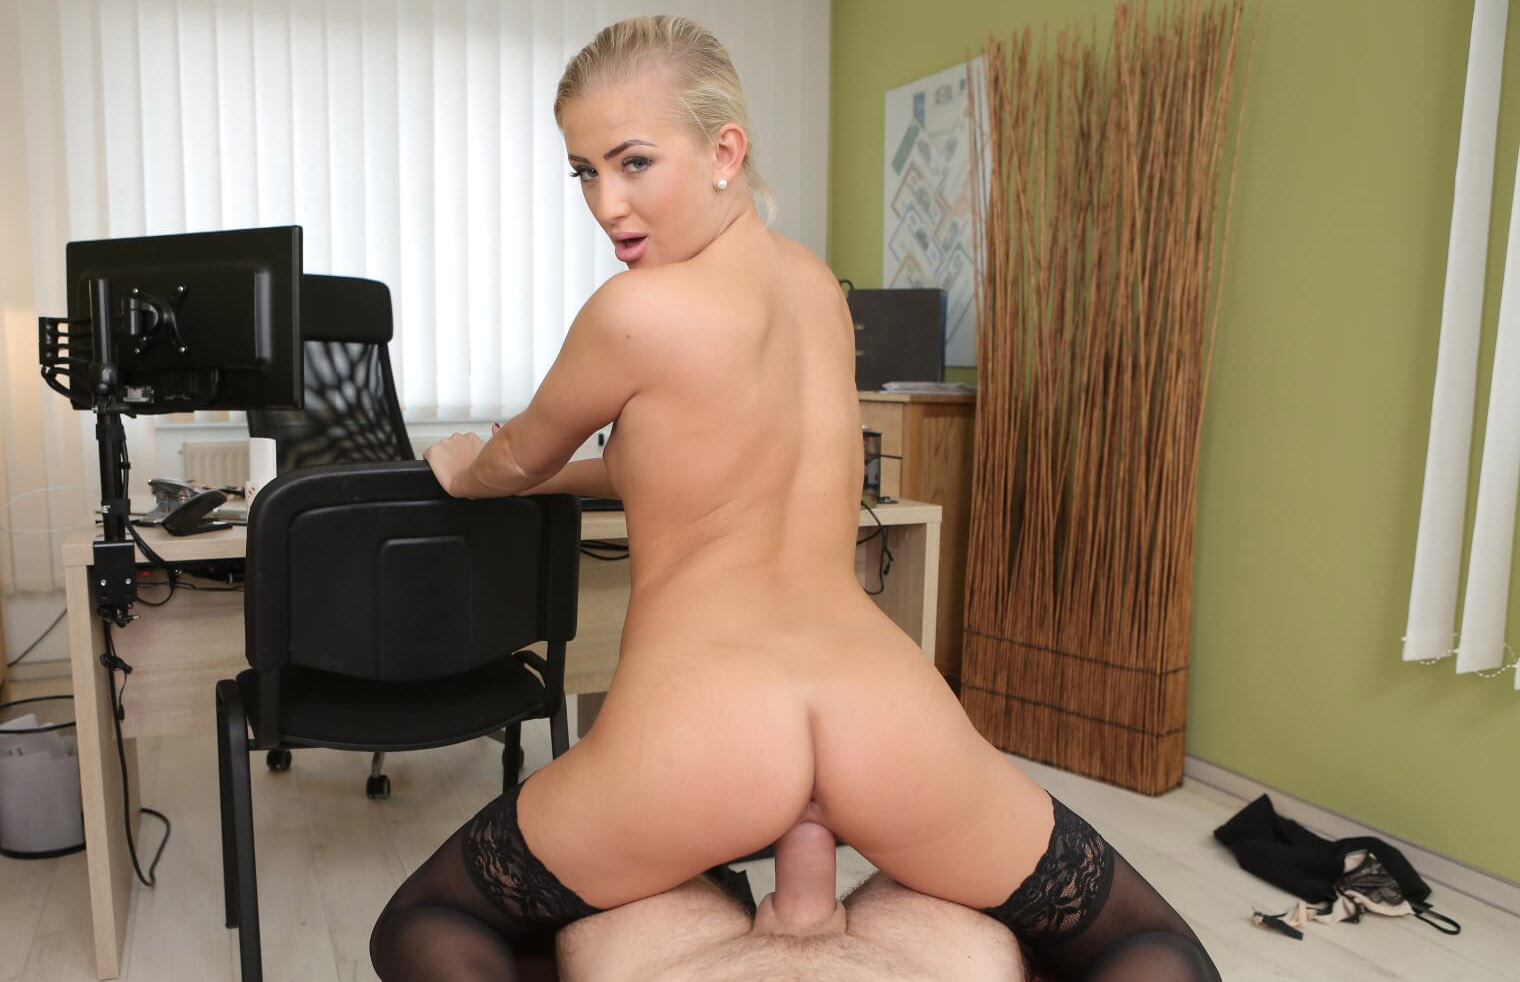 The Horny Secretary - Vr3000 - Download Full Vr Porn Video -2302